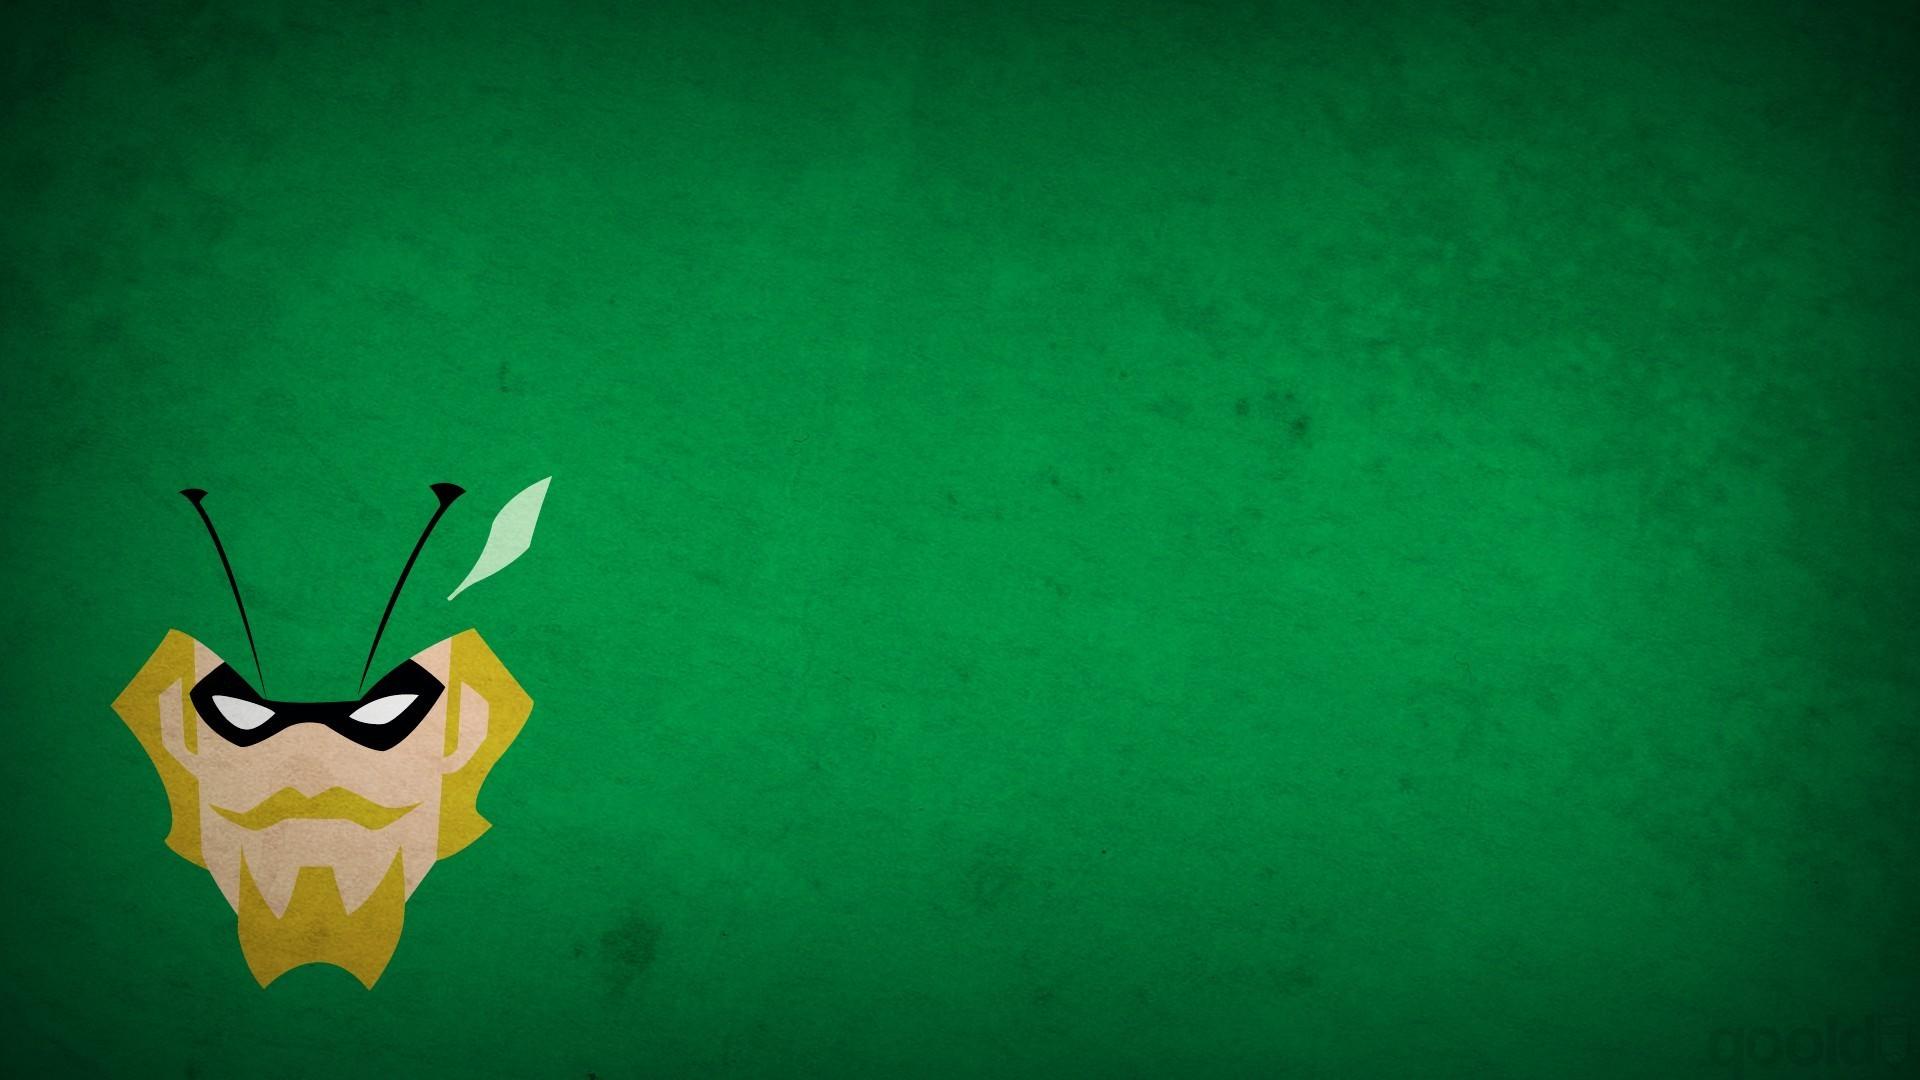 Green Arrow, Minimalism, Green Background, Blo0p, Superhero, DC Comics Wallpapers  HD / Desktop and Mobile Backgrounds